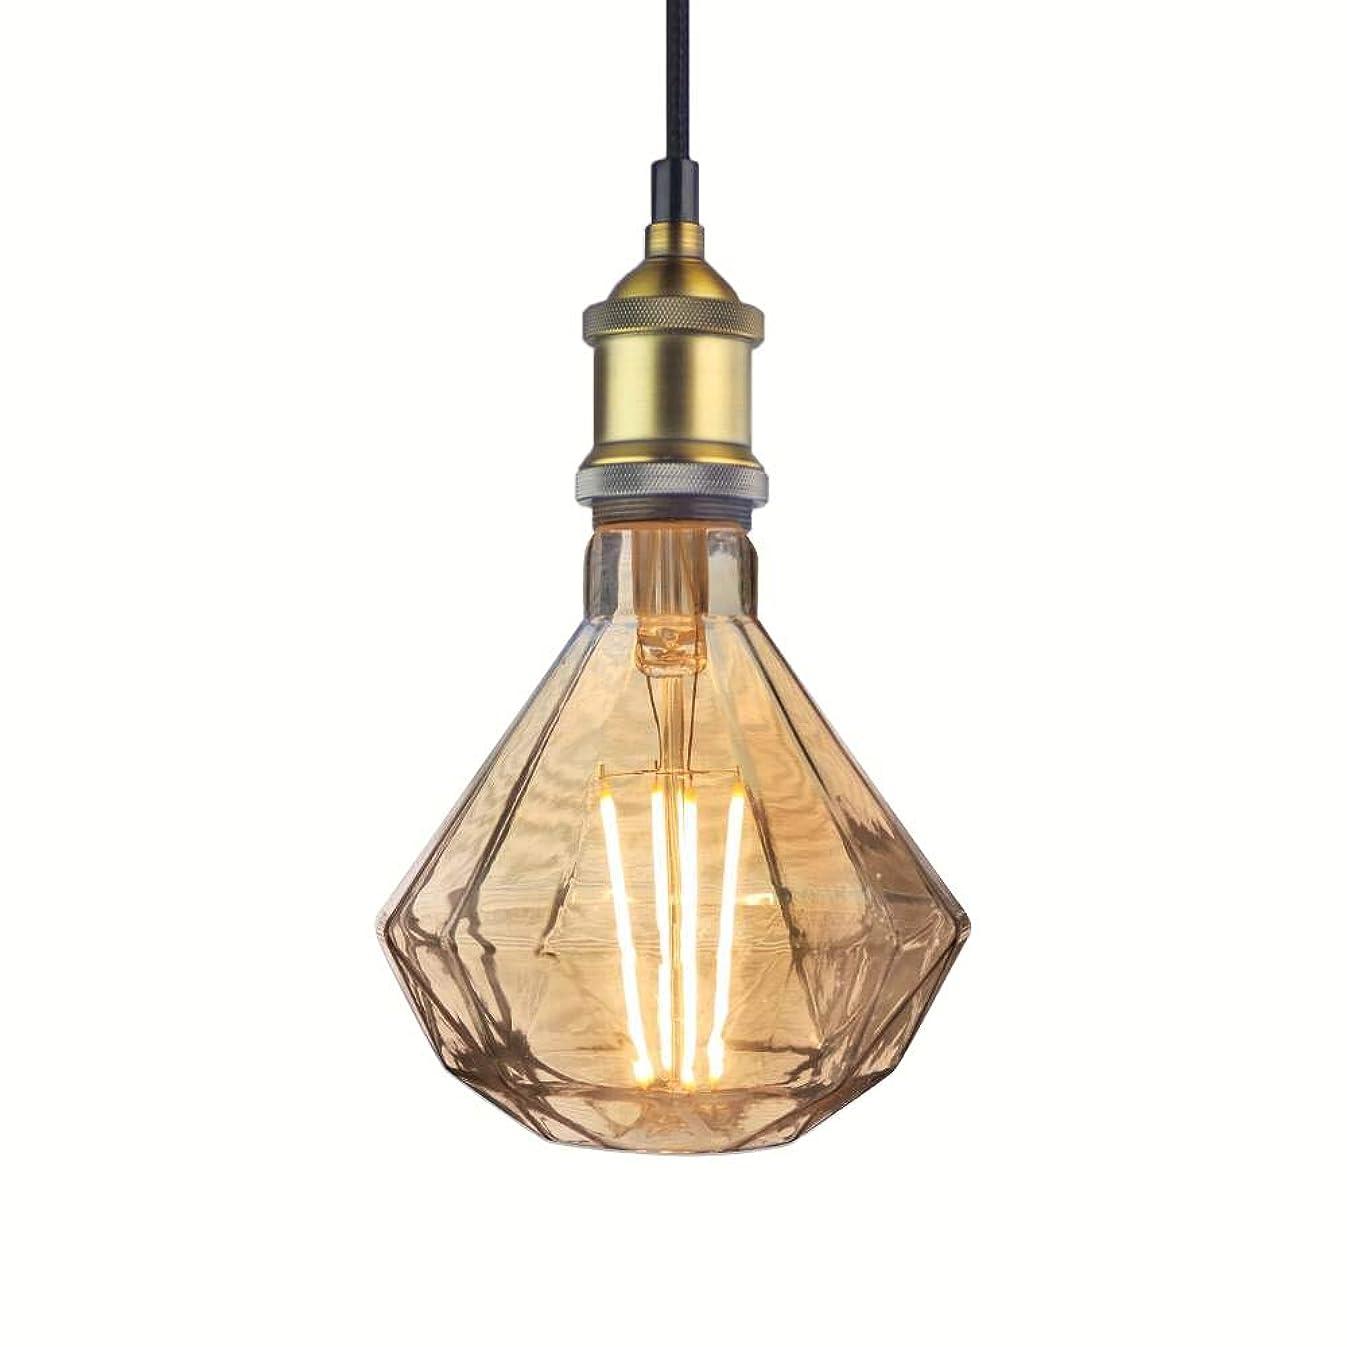 Vintage Led Glass Pendant Light - Industrial Diamond Ceiling Lamp, Light?Fixture?Indoor, Includes 6 Watts Bulb, Metal Socket, Adjustable Cord, Home Decor Gift